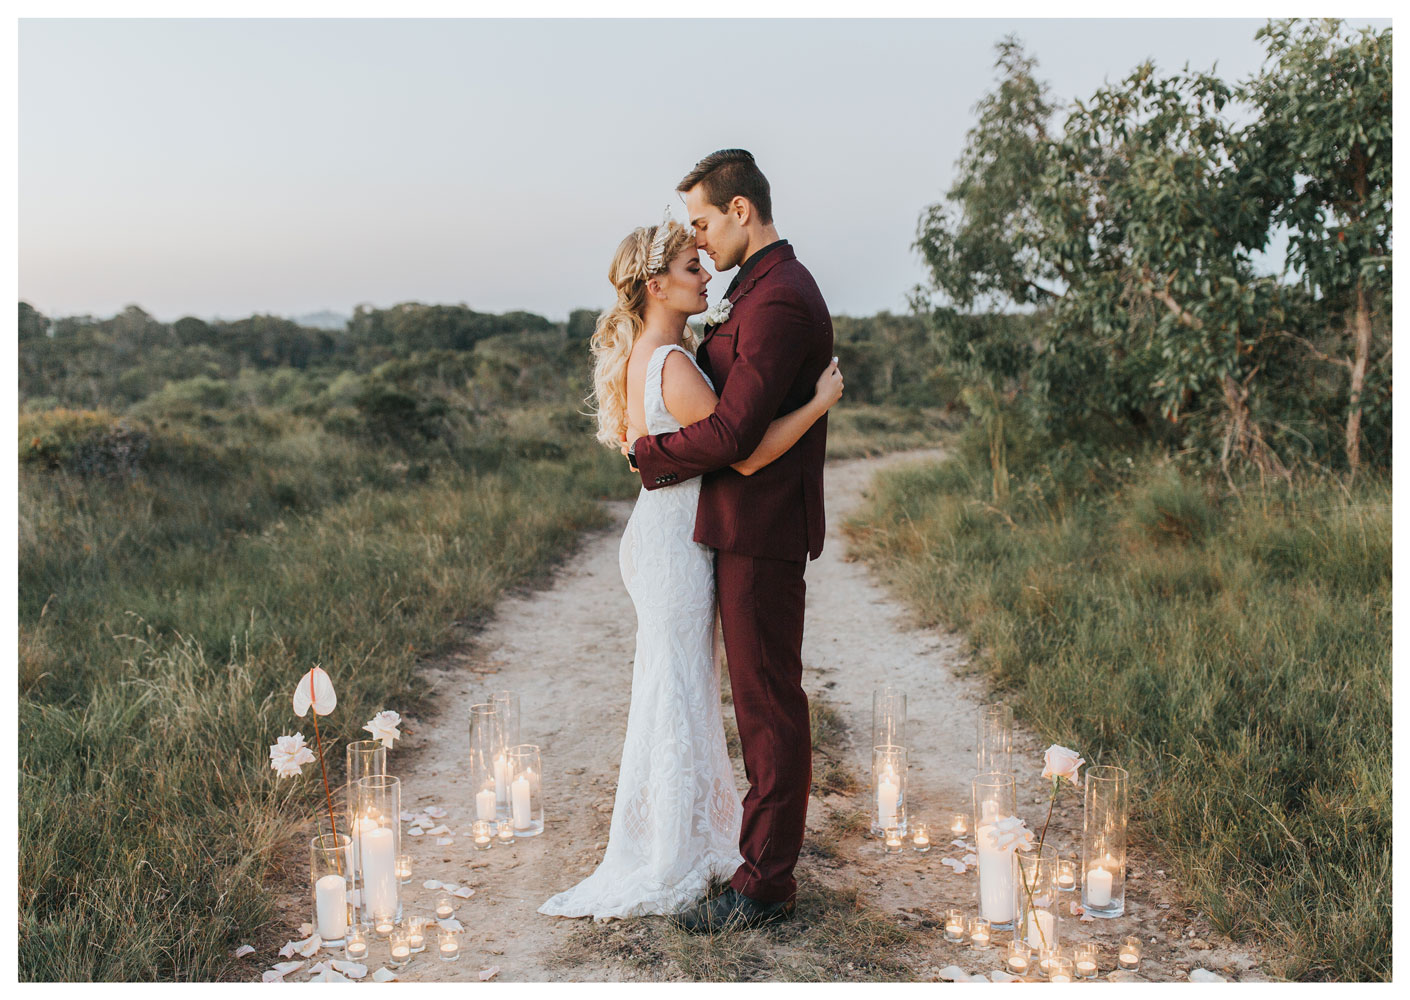 MallorySparkles-Weddings-20199.jpg